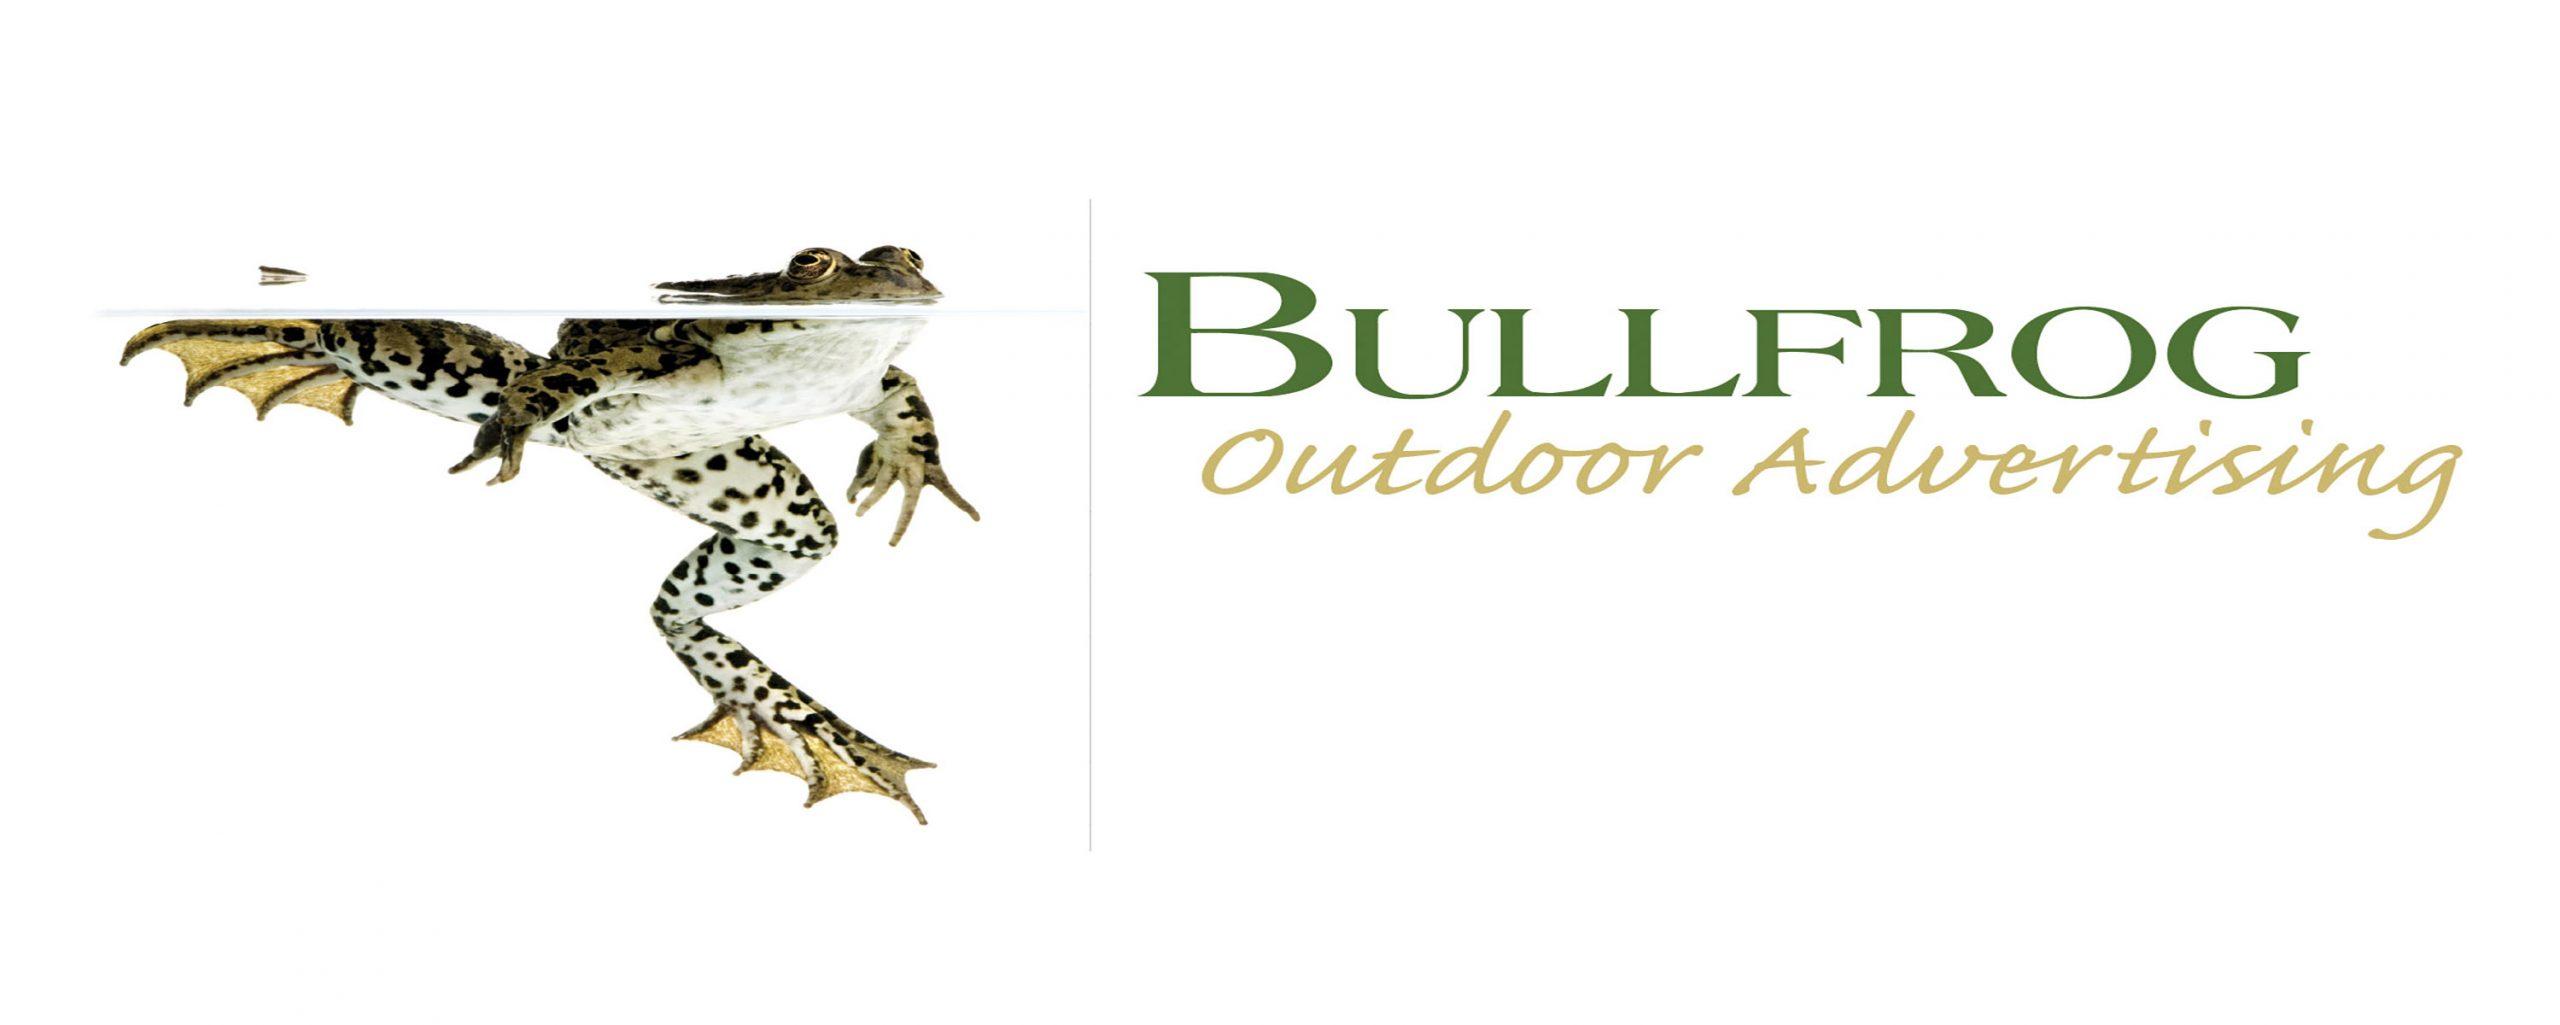 Bullfrog Outdoor Advertising